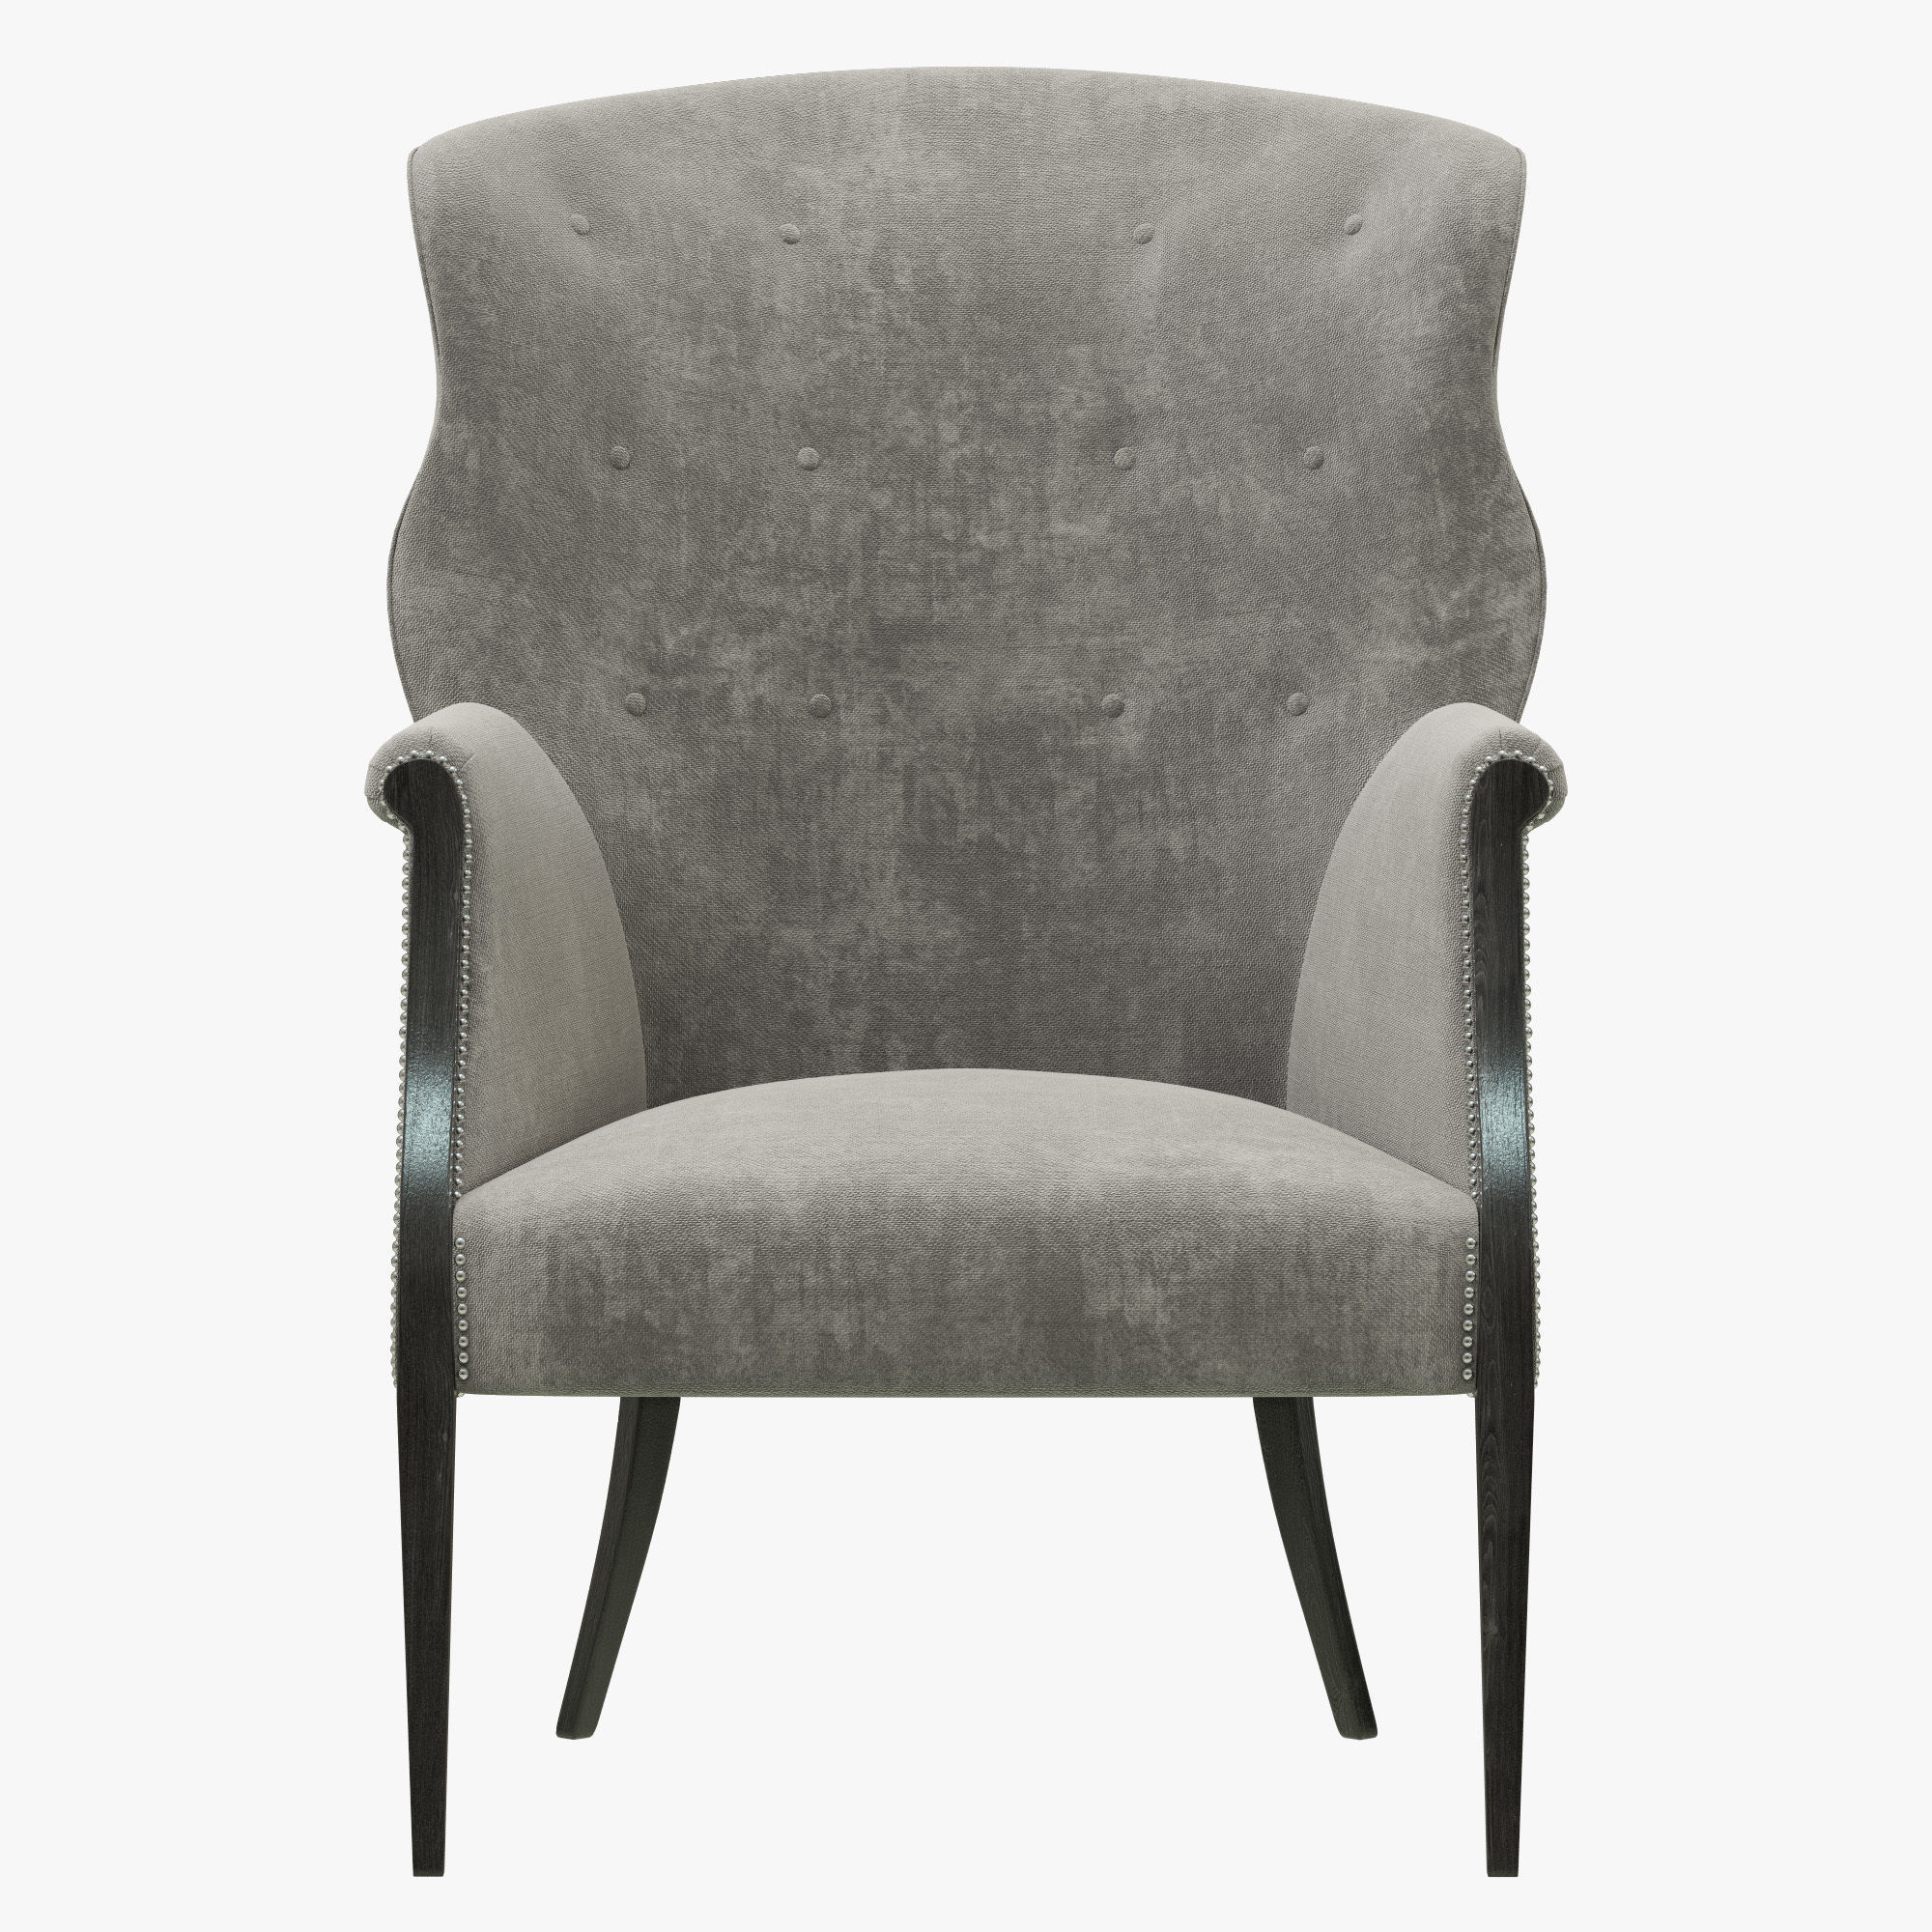 Restoration Hardware Edwardian Wingback Chair 3d Model